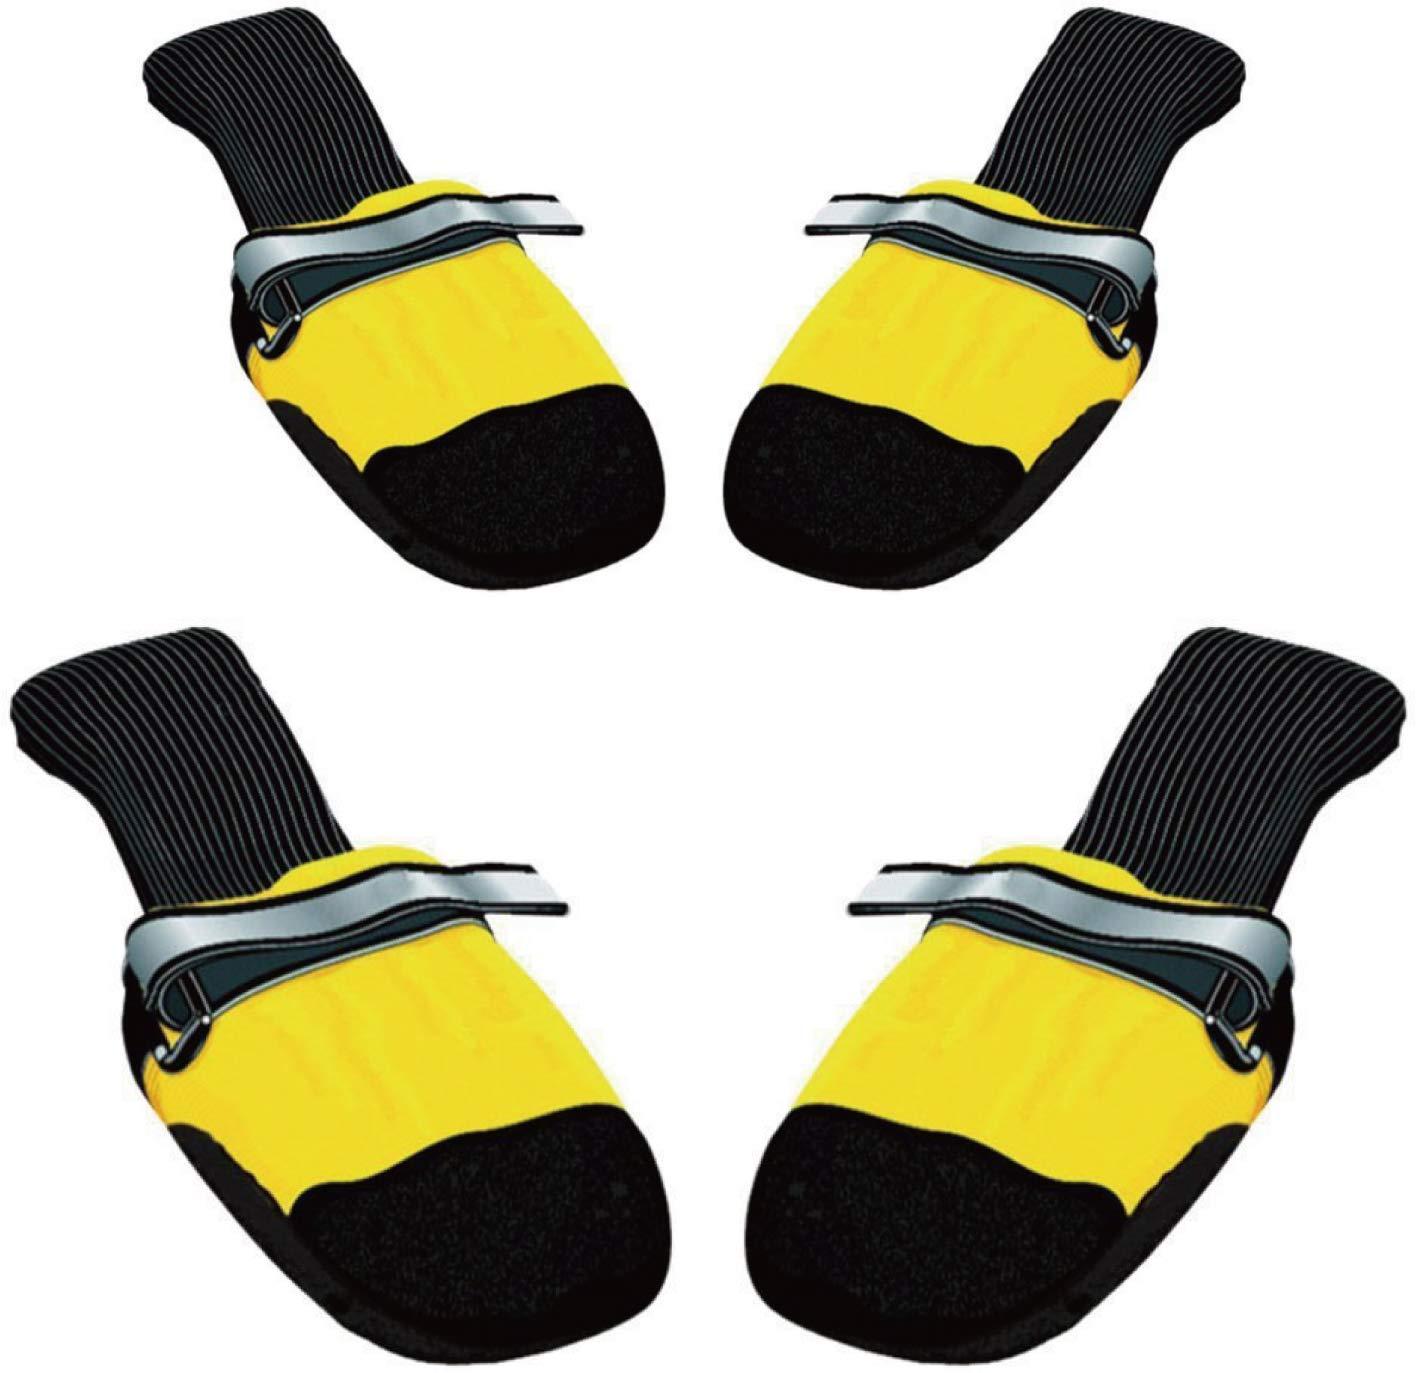 Muttluks Original All-Weather IB to XXL Dog Boots, 4 Pack (Yellow, Medium (3.25-3.75in)) by Muttluks